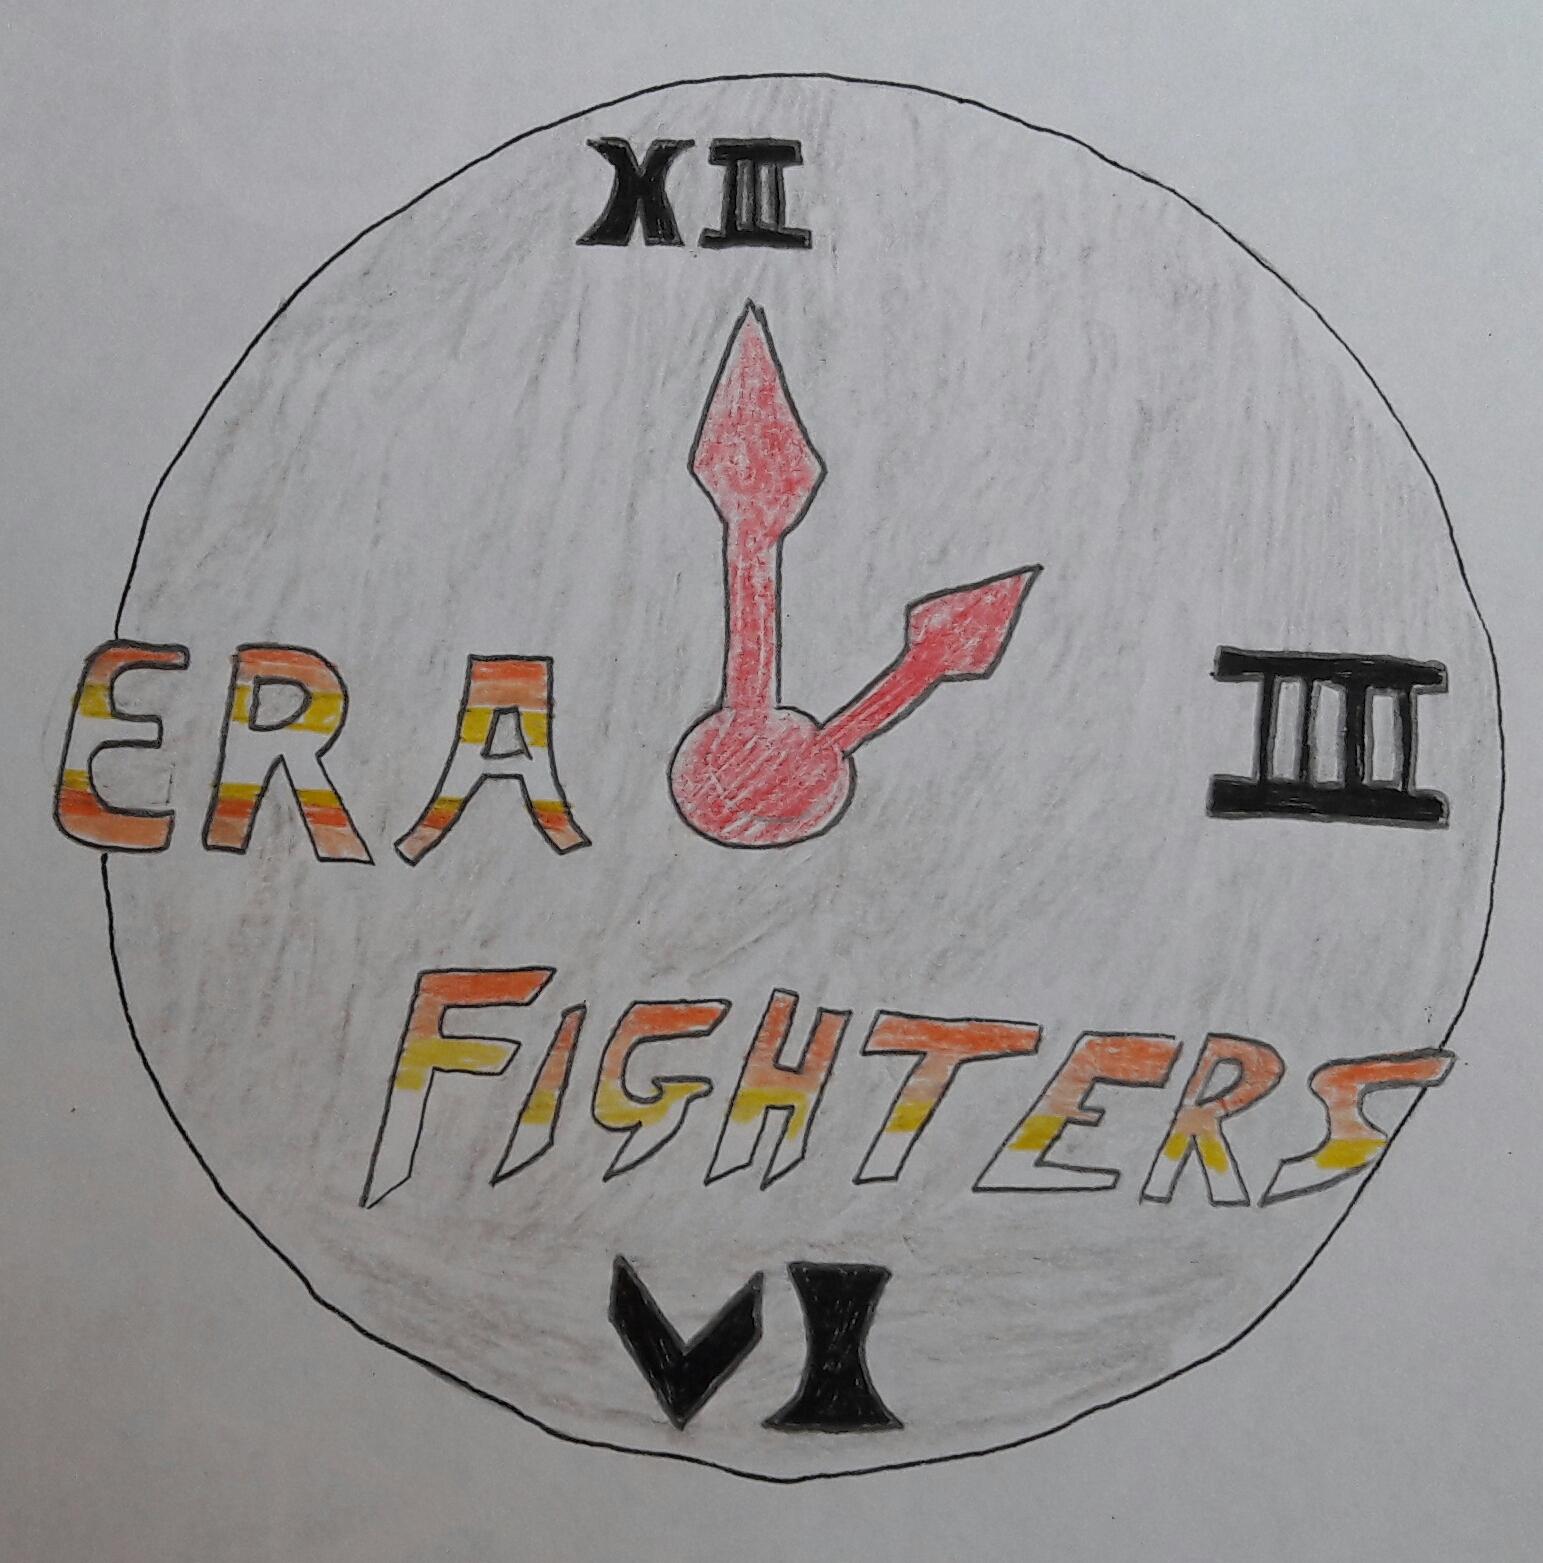 Era Fighters